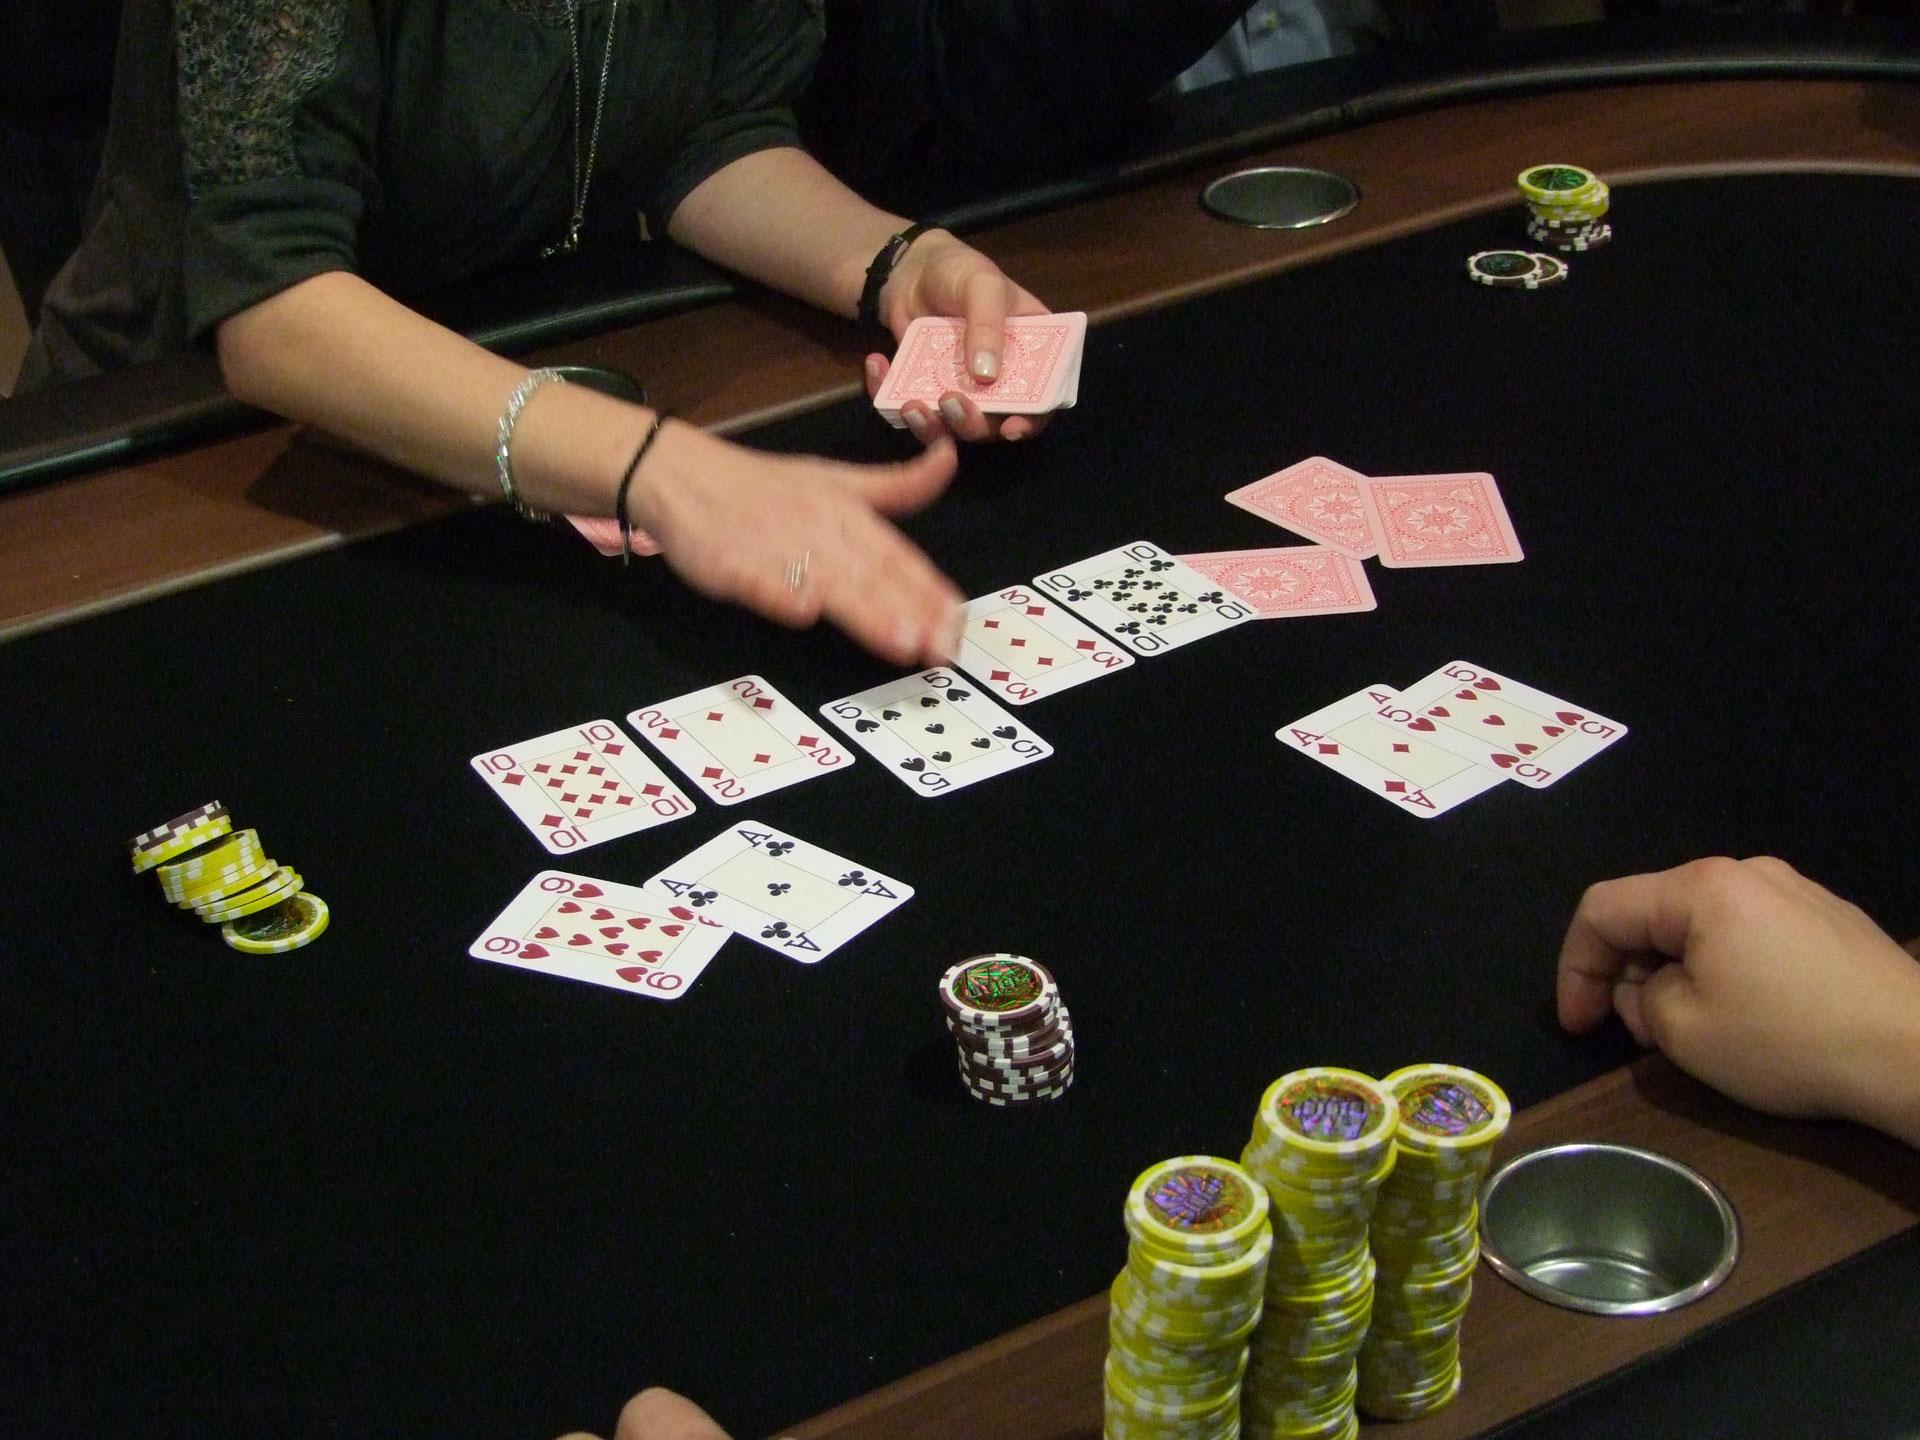 Egt casino